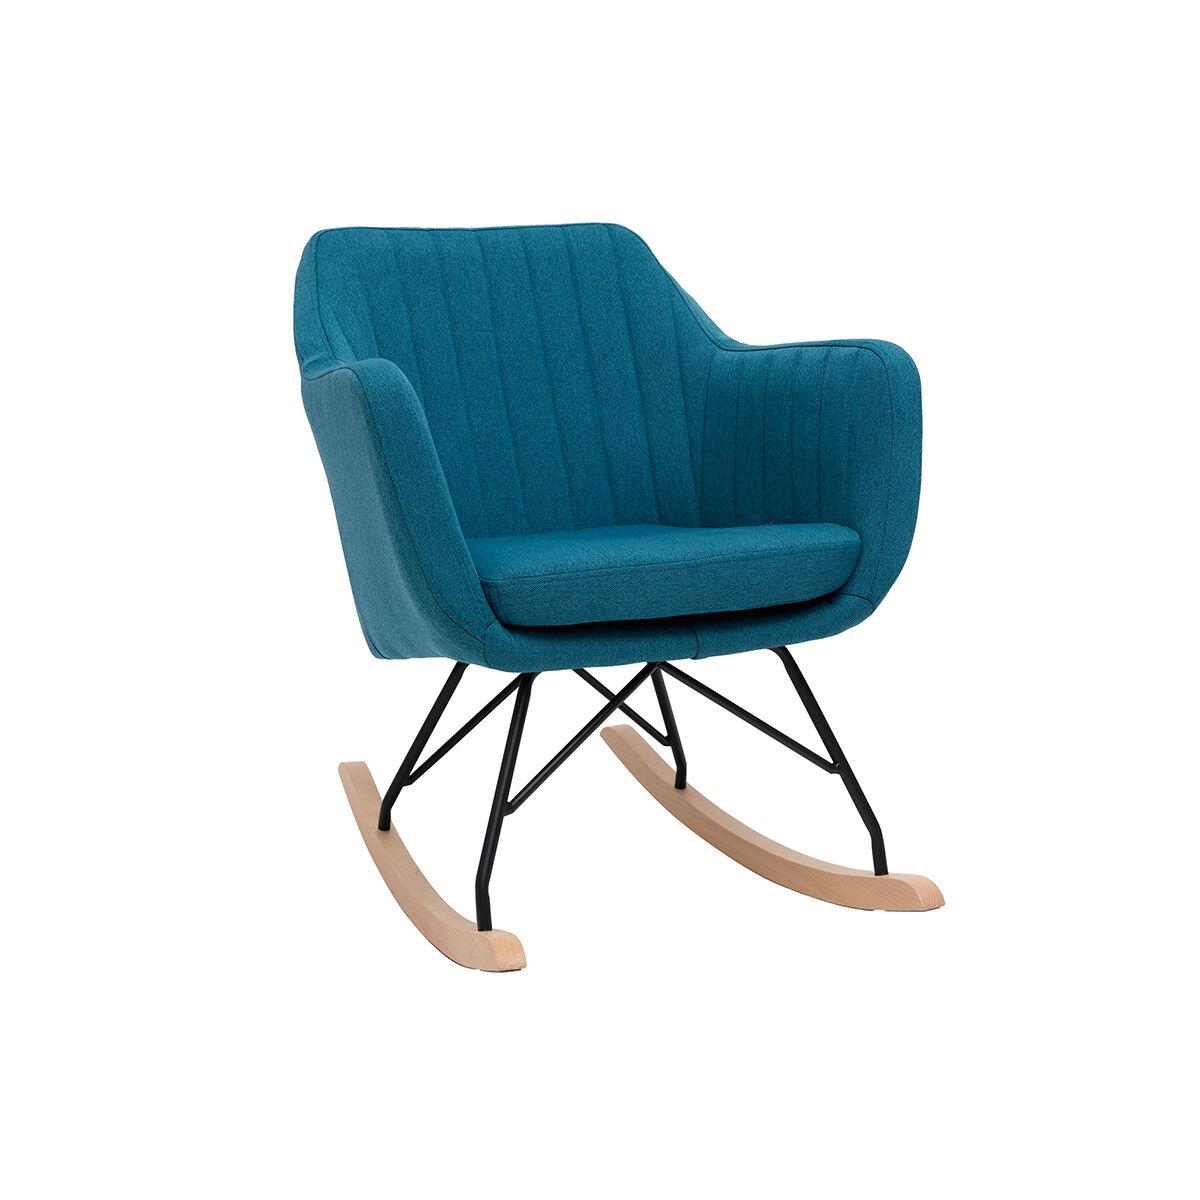 Miliboo Rocking chair scandinave en tissu bleu canard ALEYNA